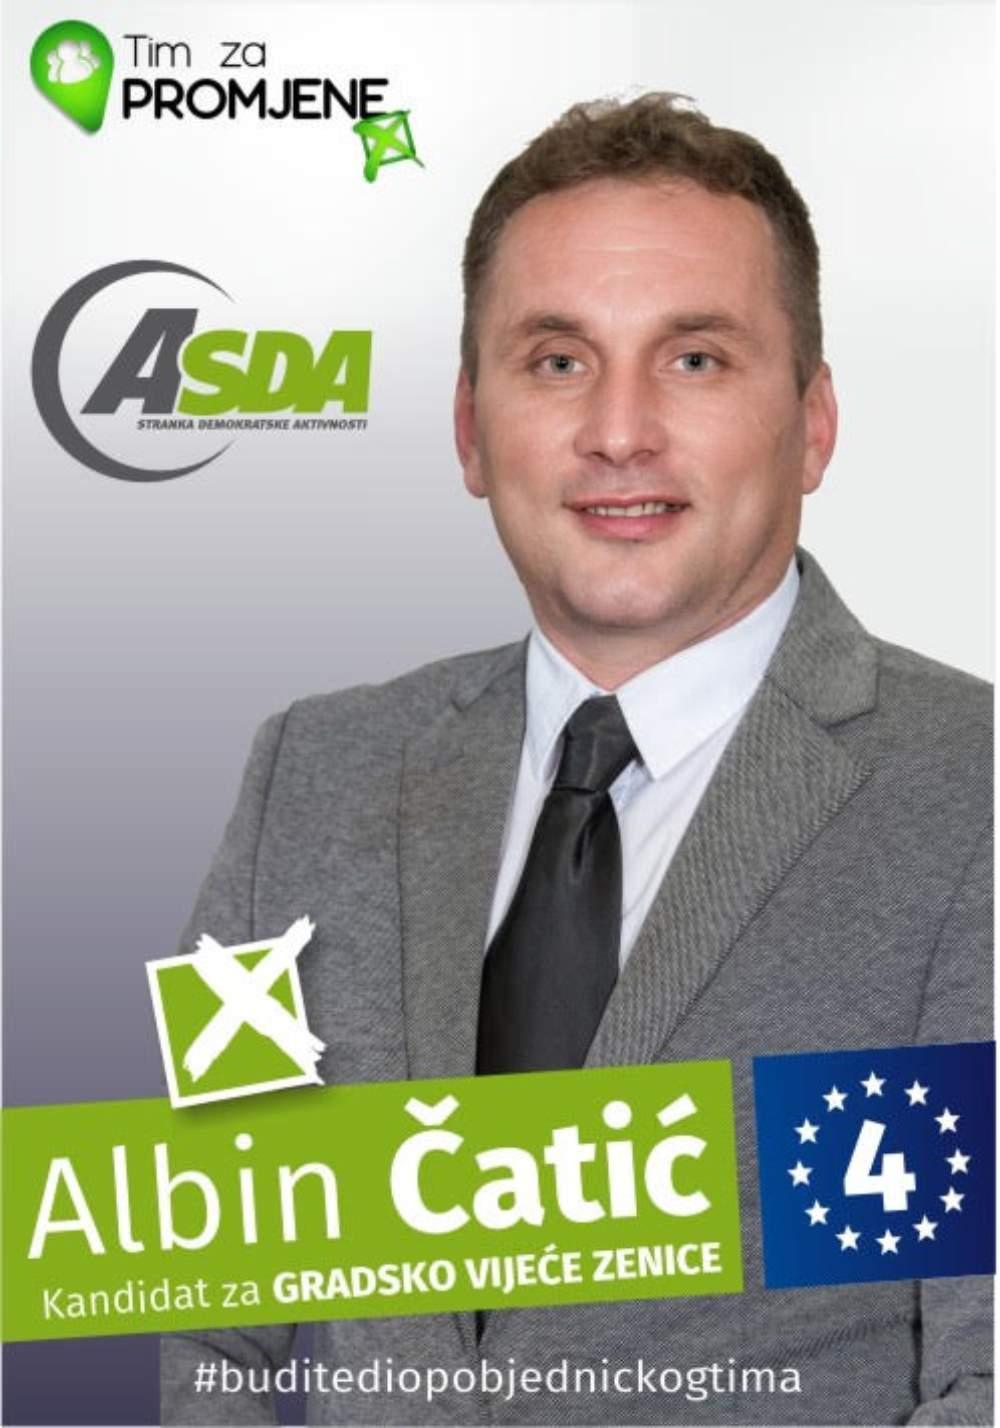 Albin Čatić